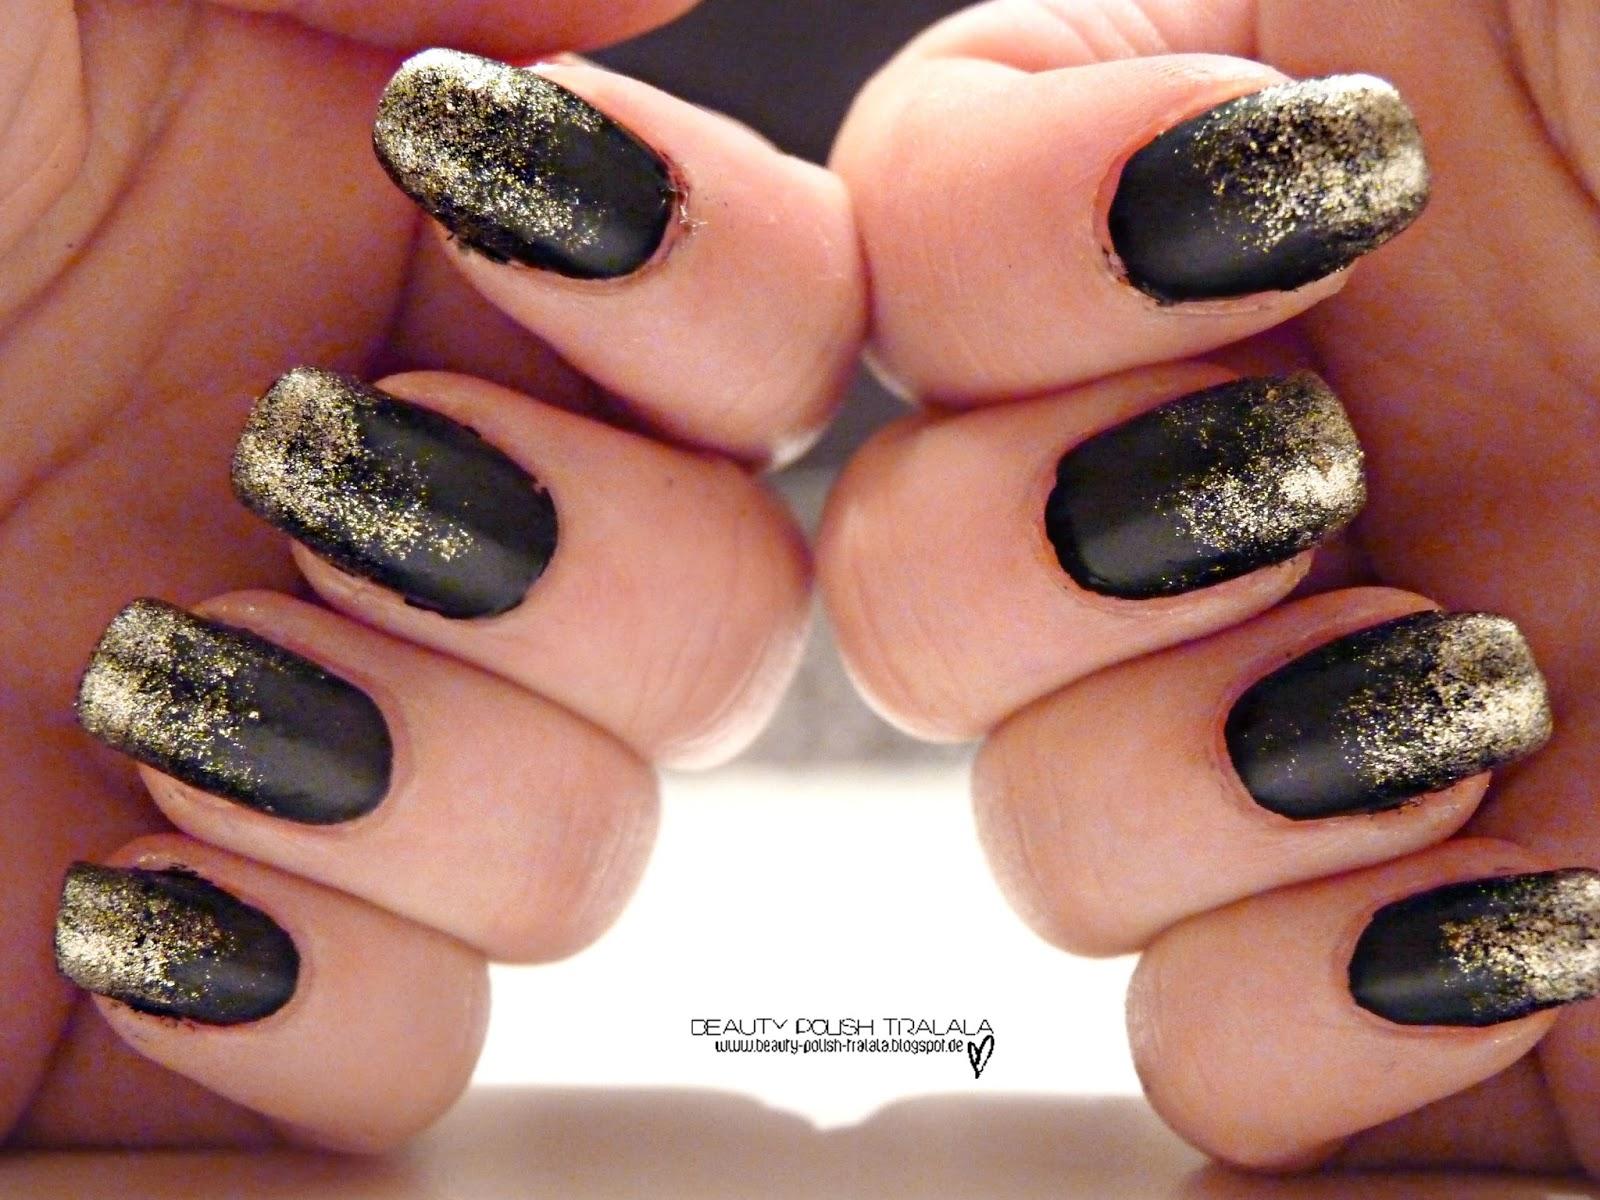 beauty polish tralala naildesign goldregen. Black Bedroom Furniture Sets. Home Design Ideas